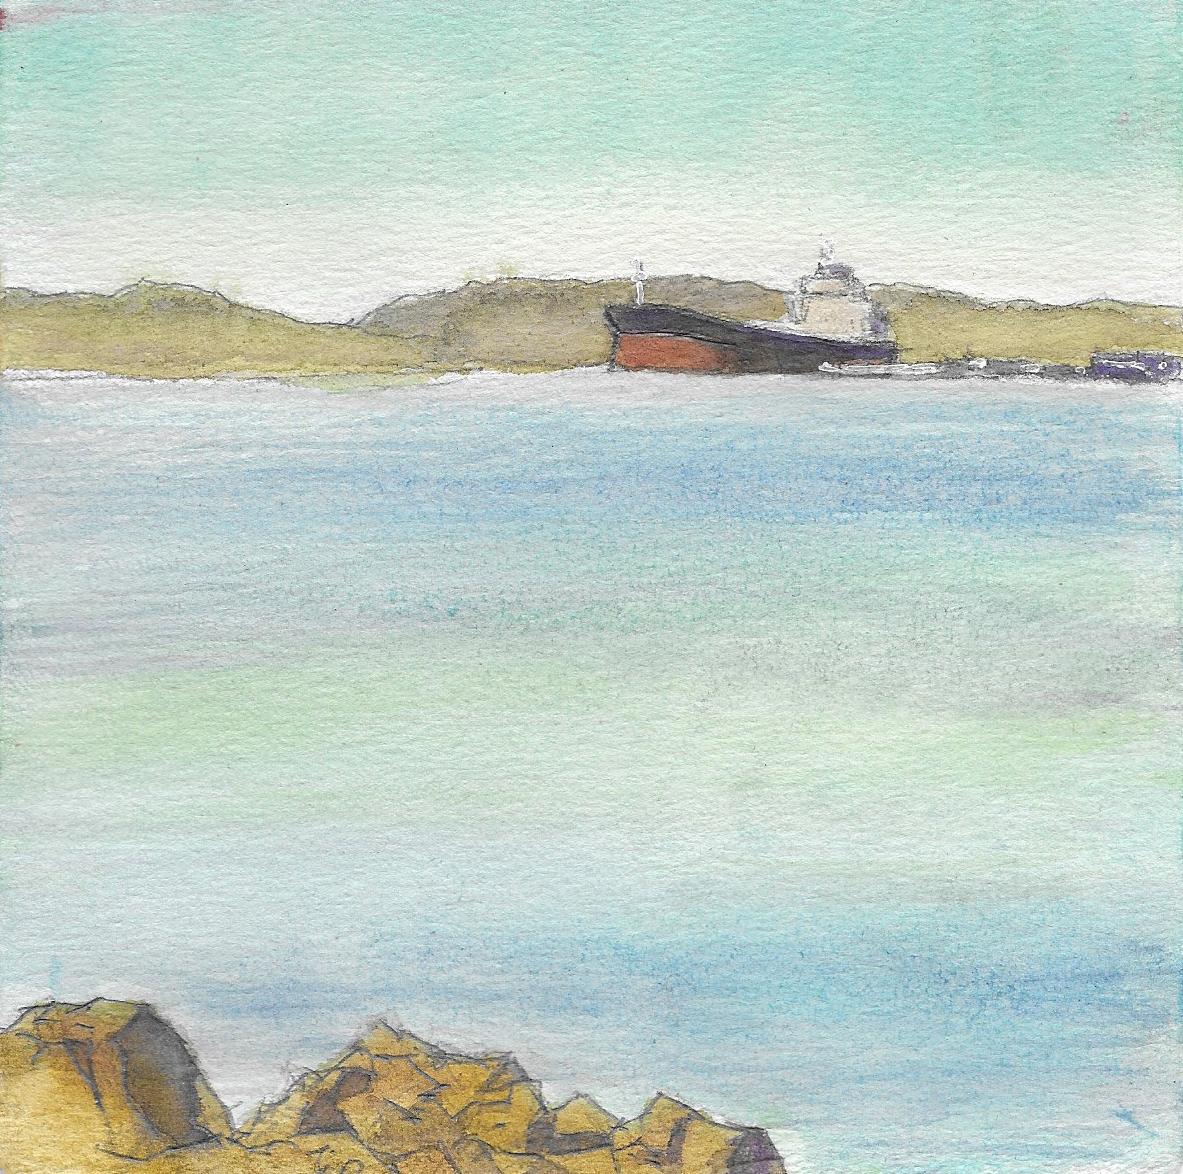 Tanker, Point Richmond